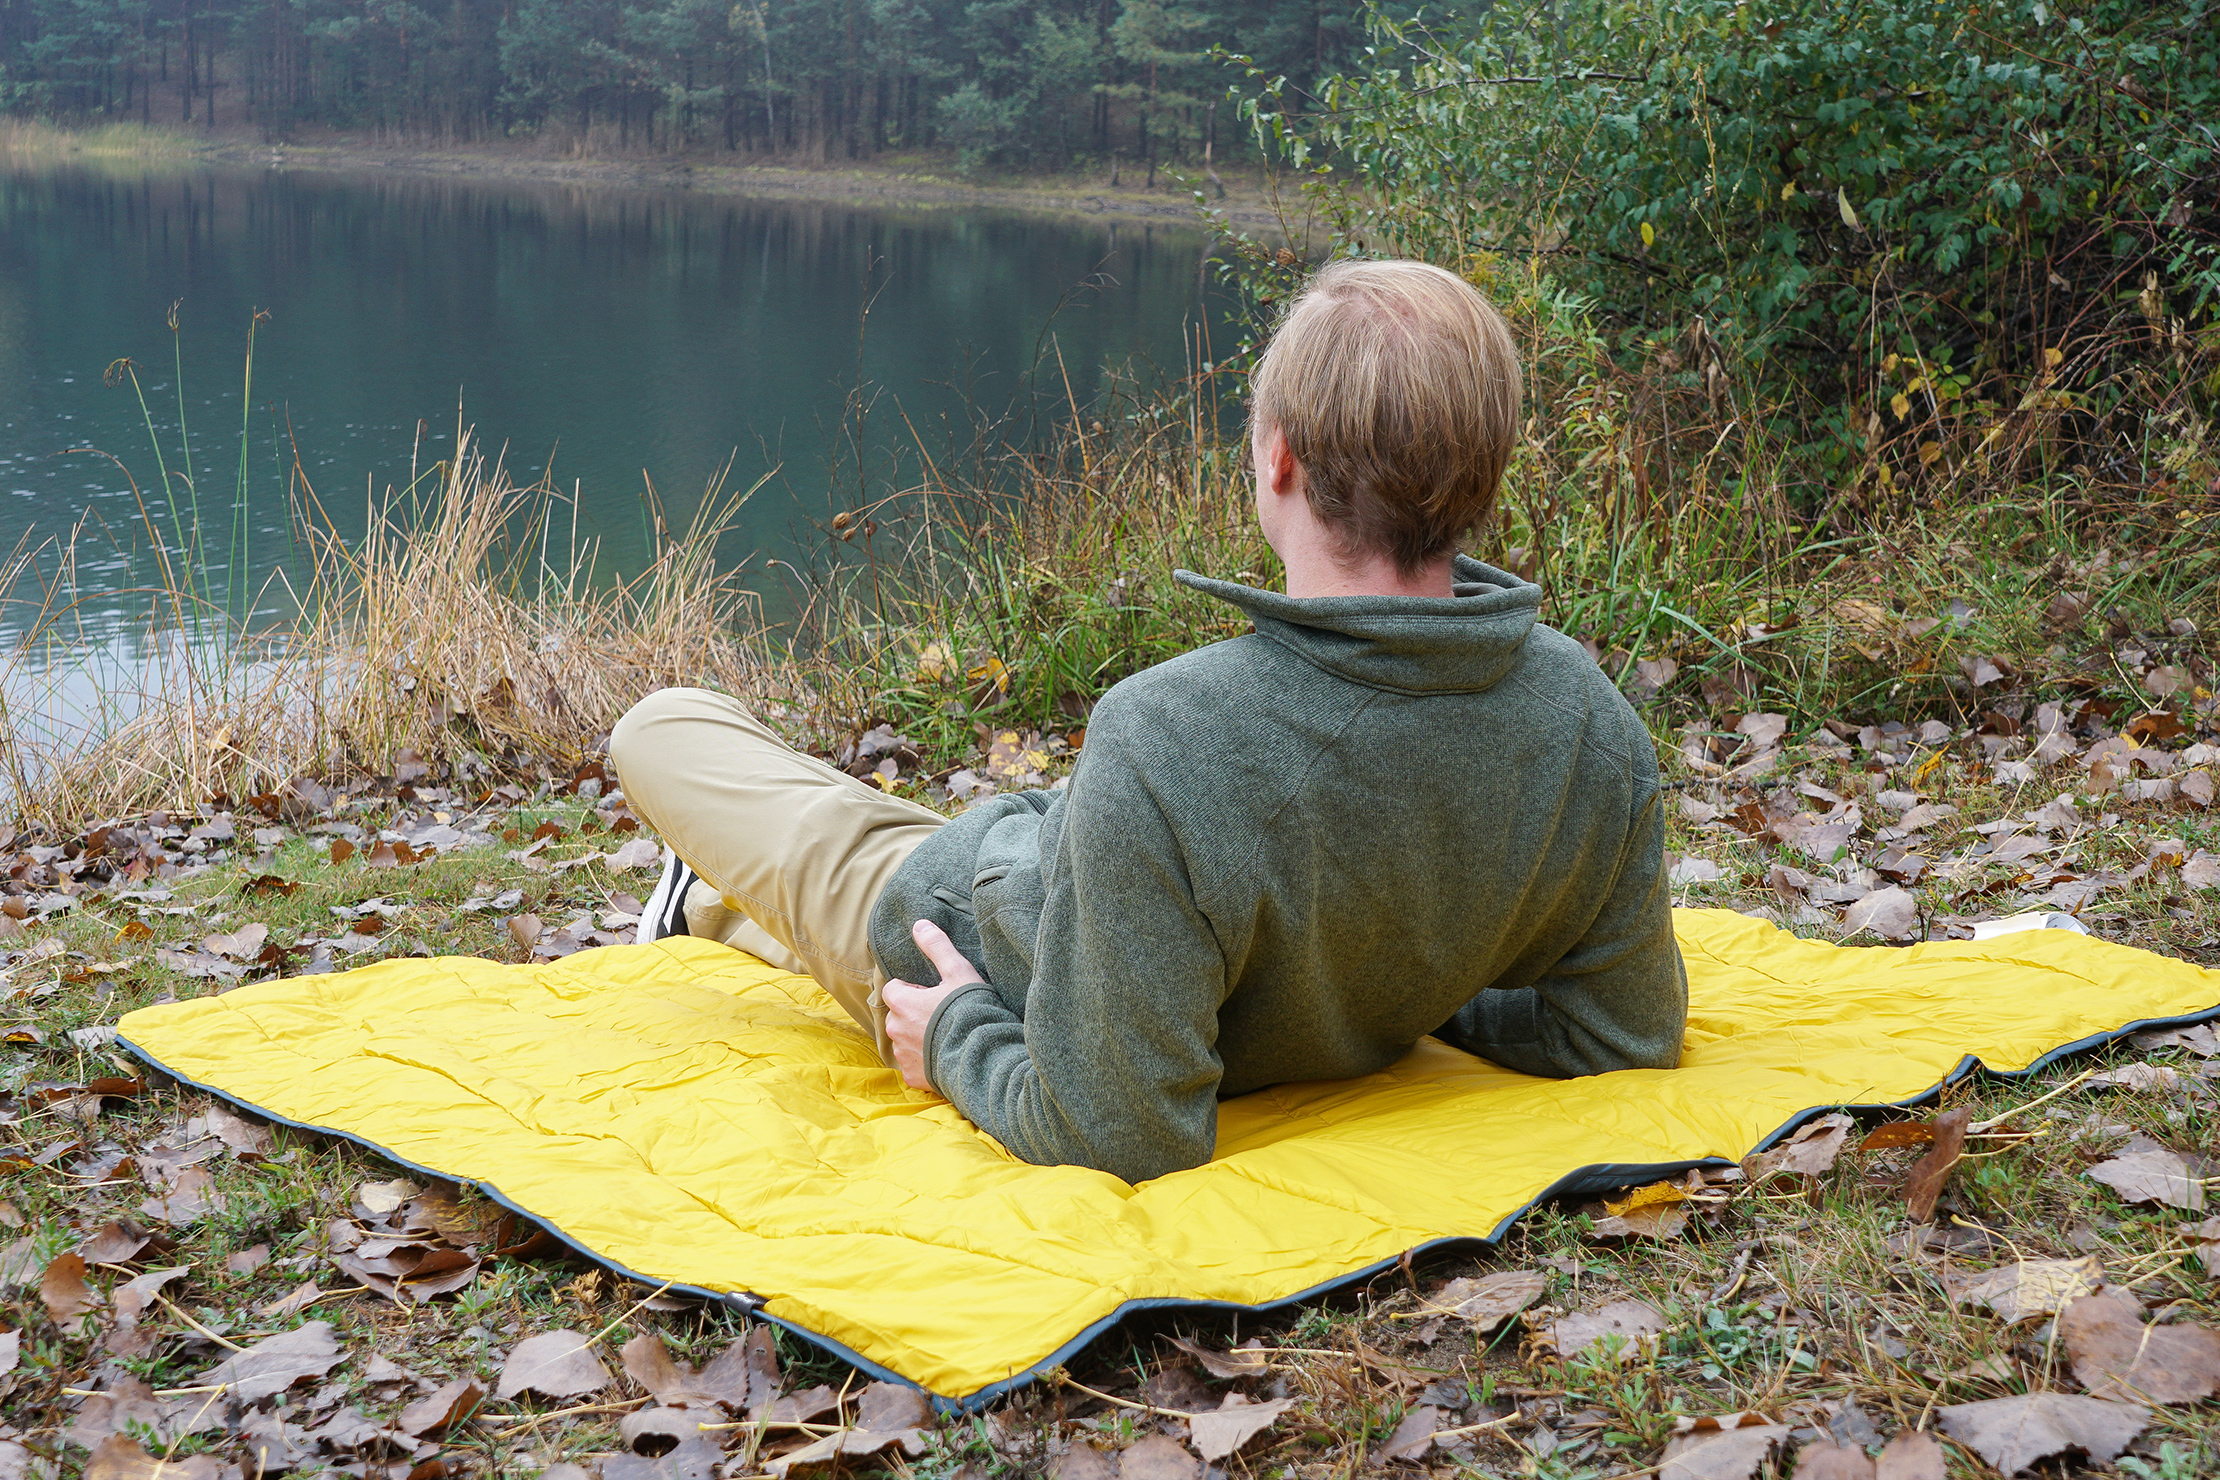 Staycation Ideas | Visit a regional park